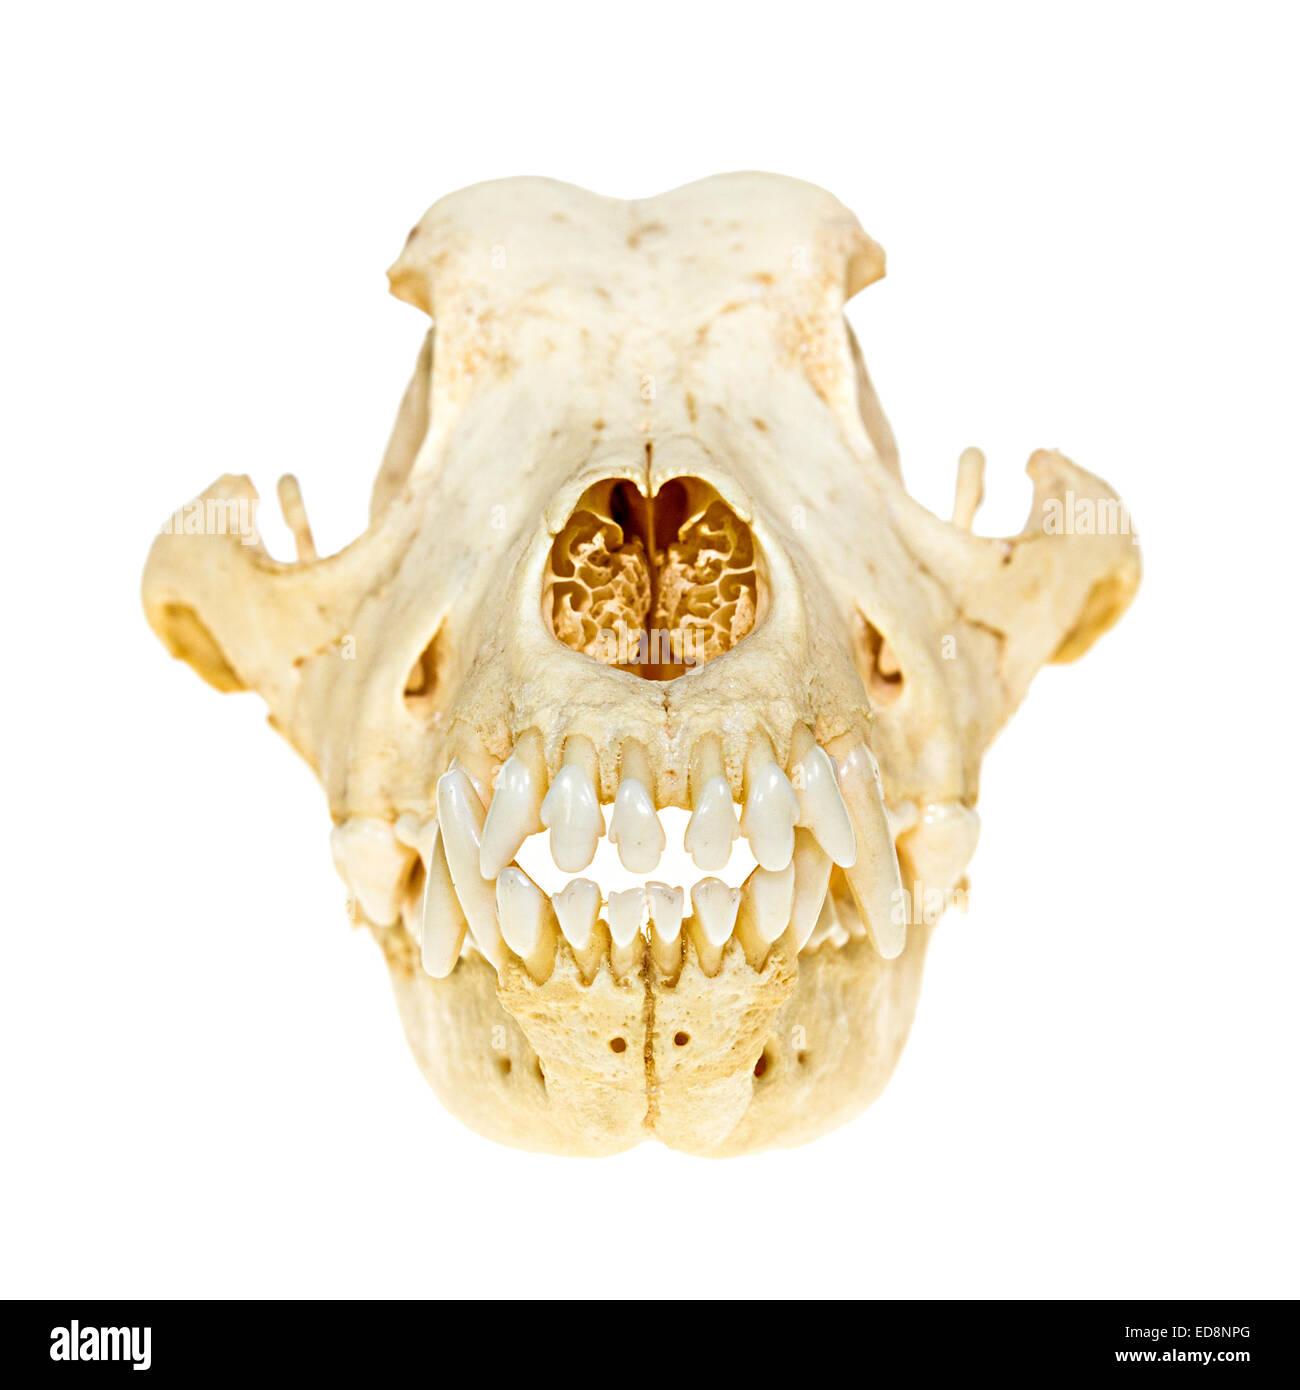 Dog Skull Anatomy Stock Photos & Dog Skull Anatomy Stock Images - Alamy